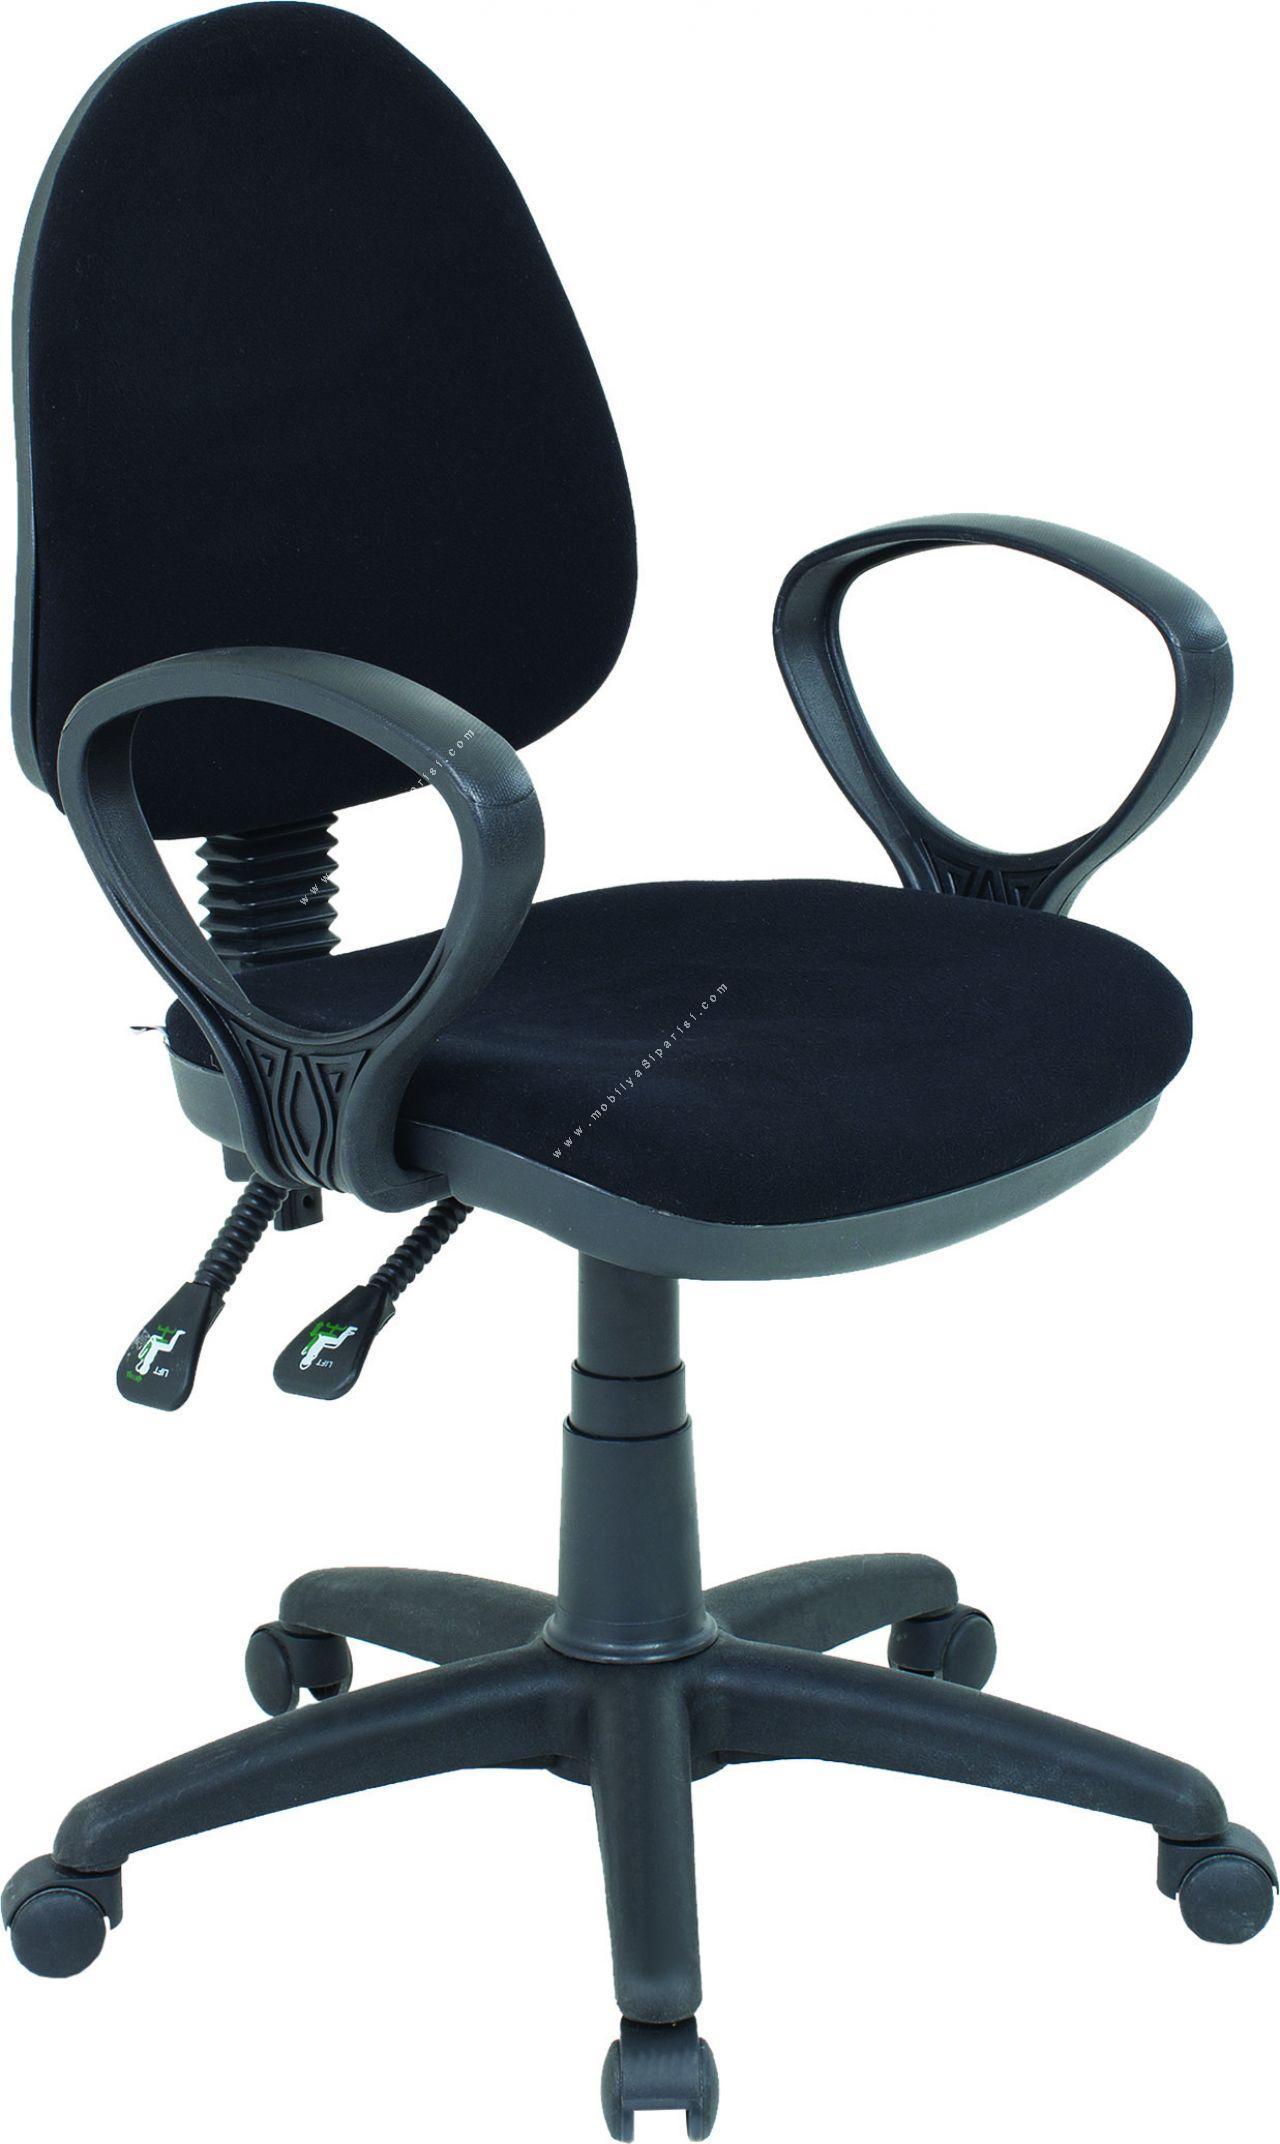 sekreter plastik çalışma koltuğu